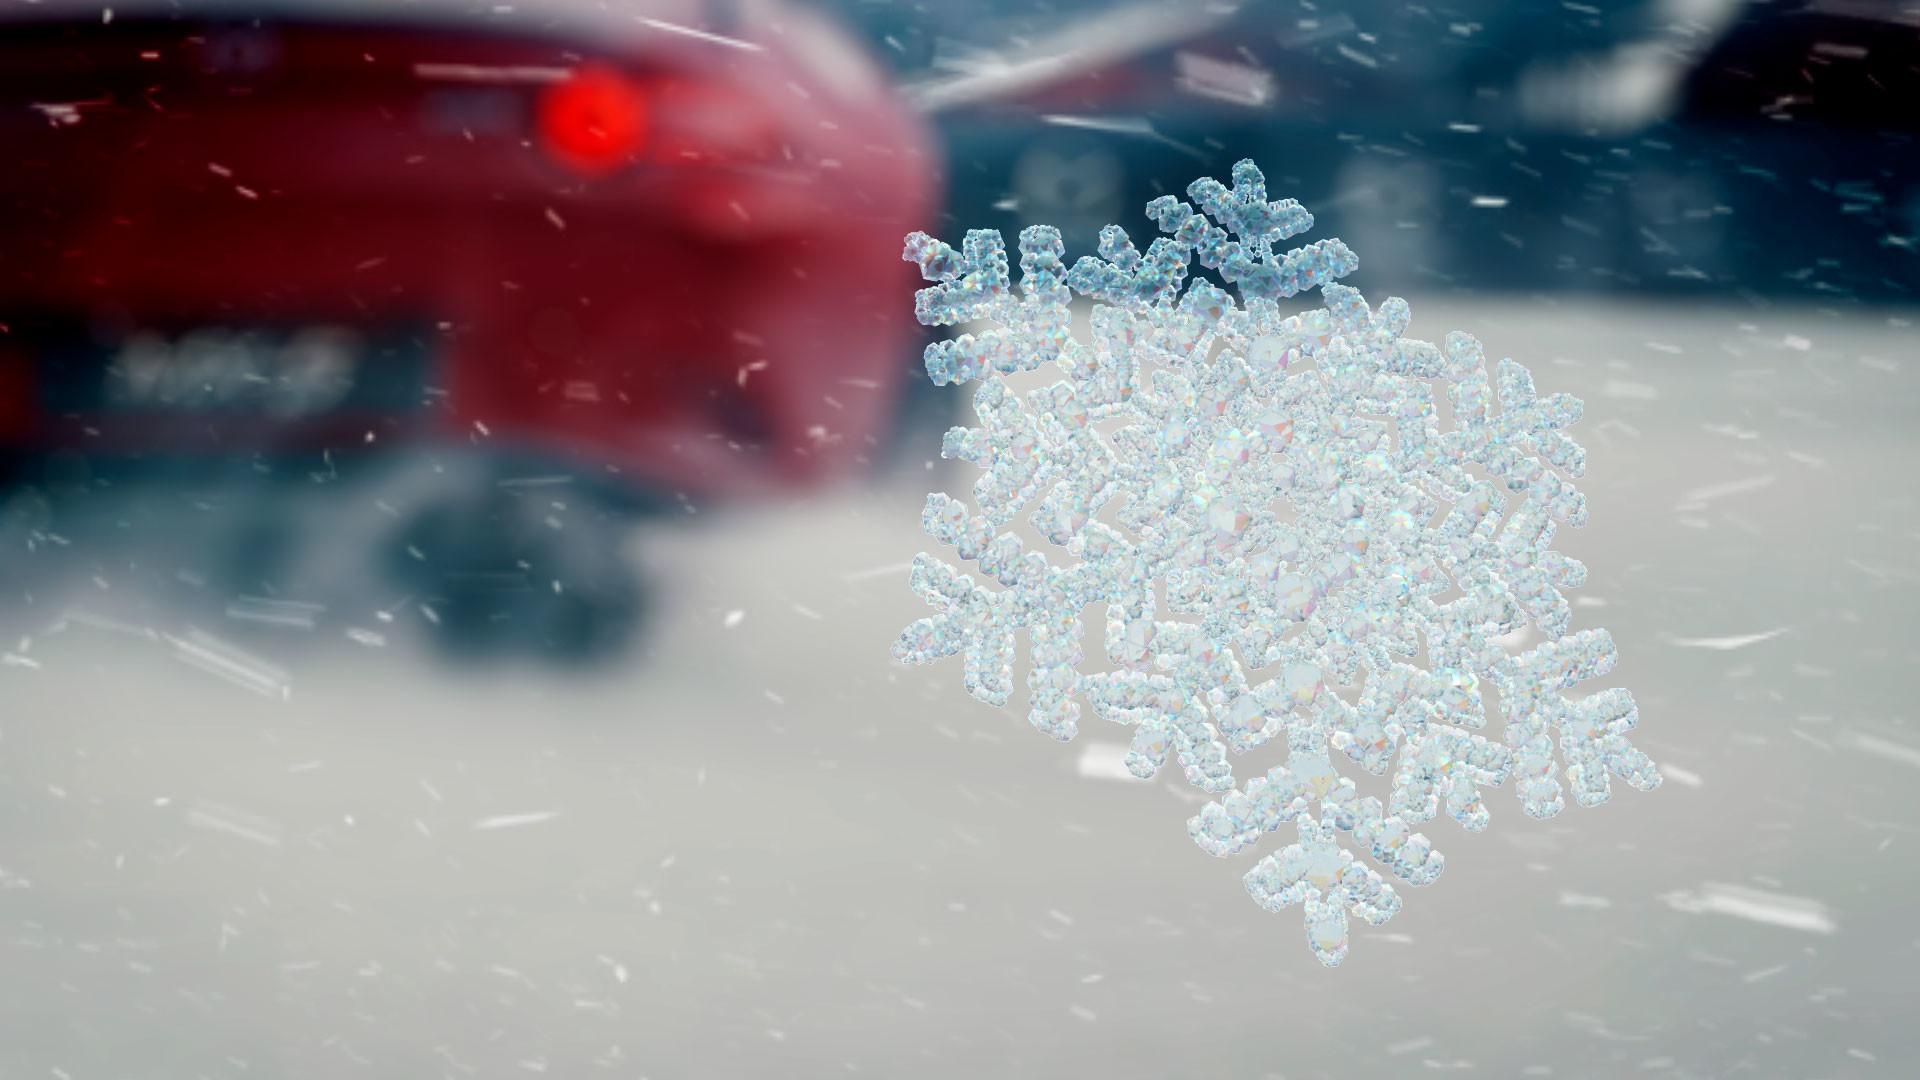 Milush manimendra mazda snowflake 005 ae